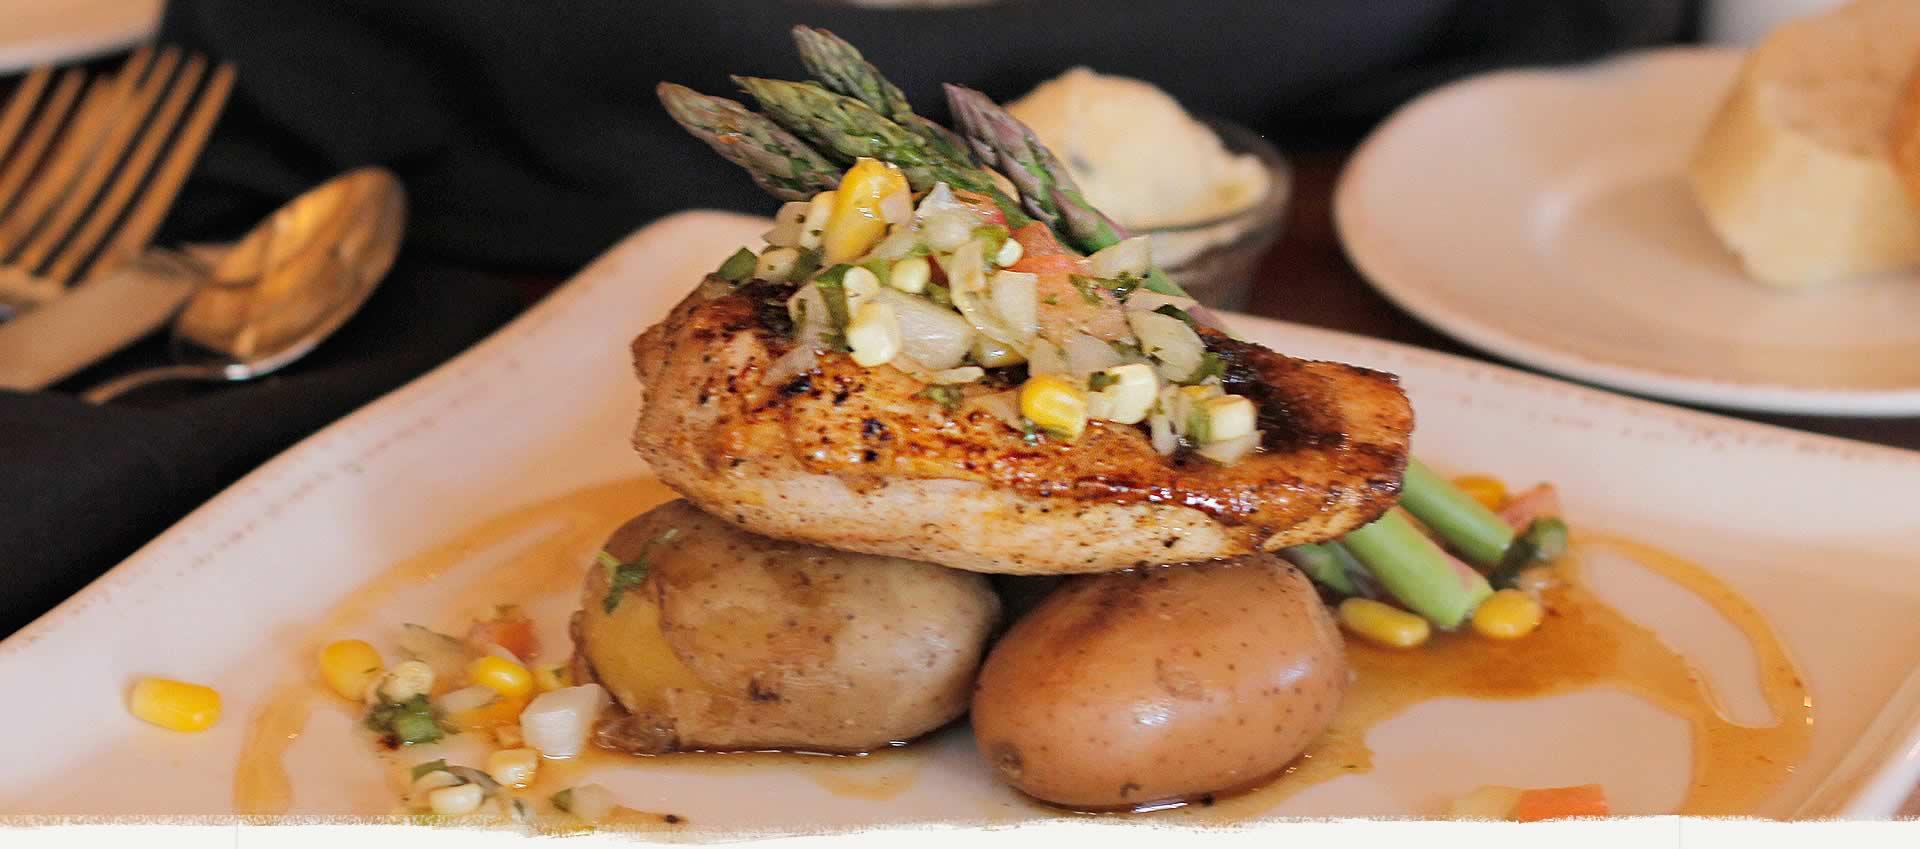 High_restaurant_food3